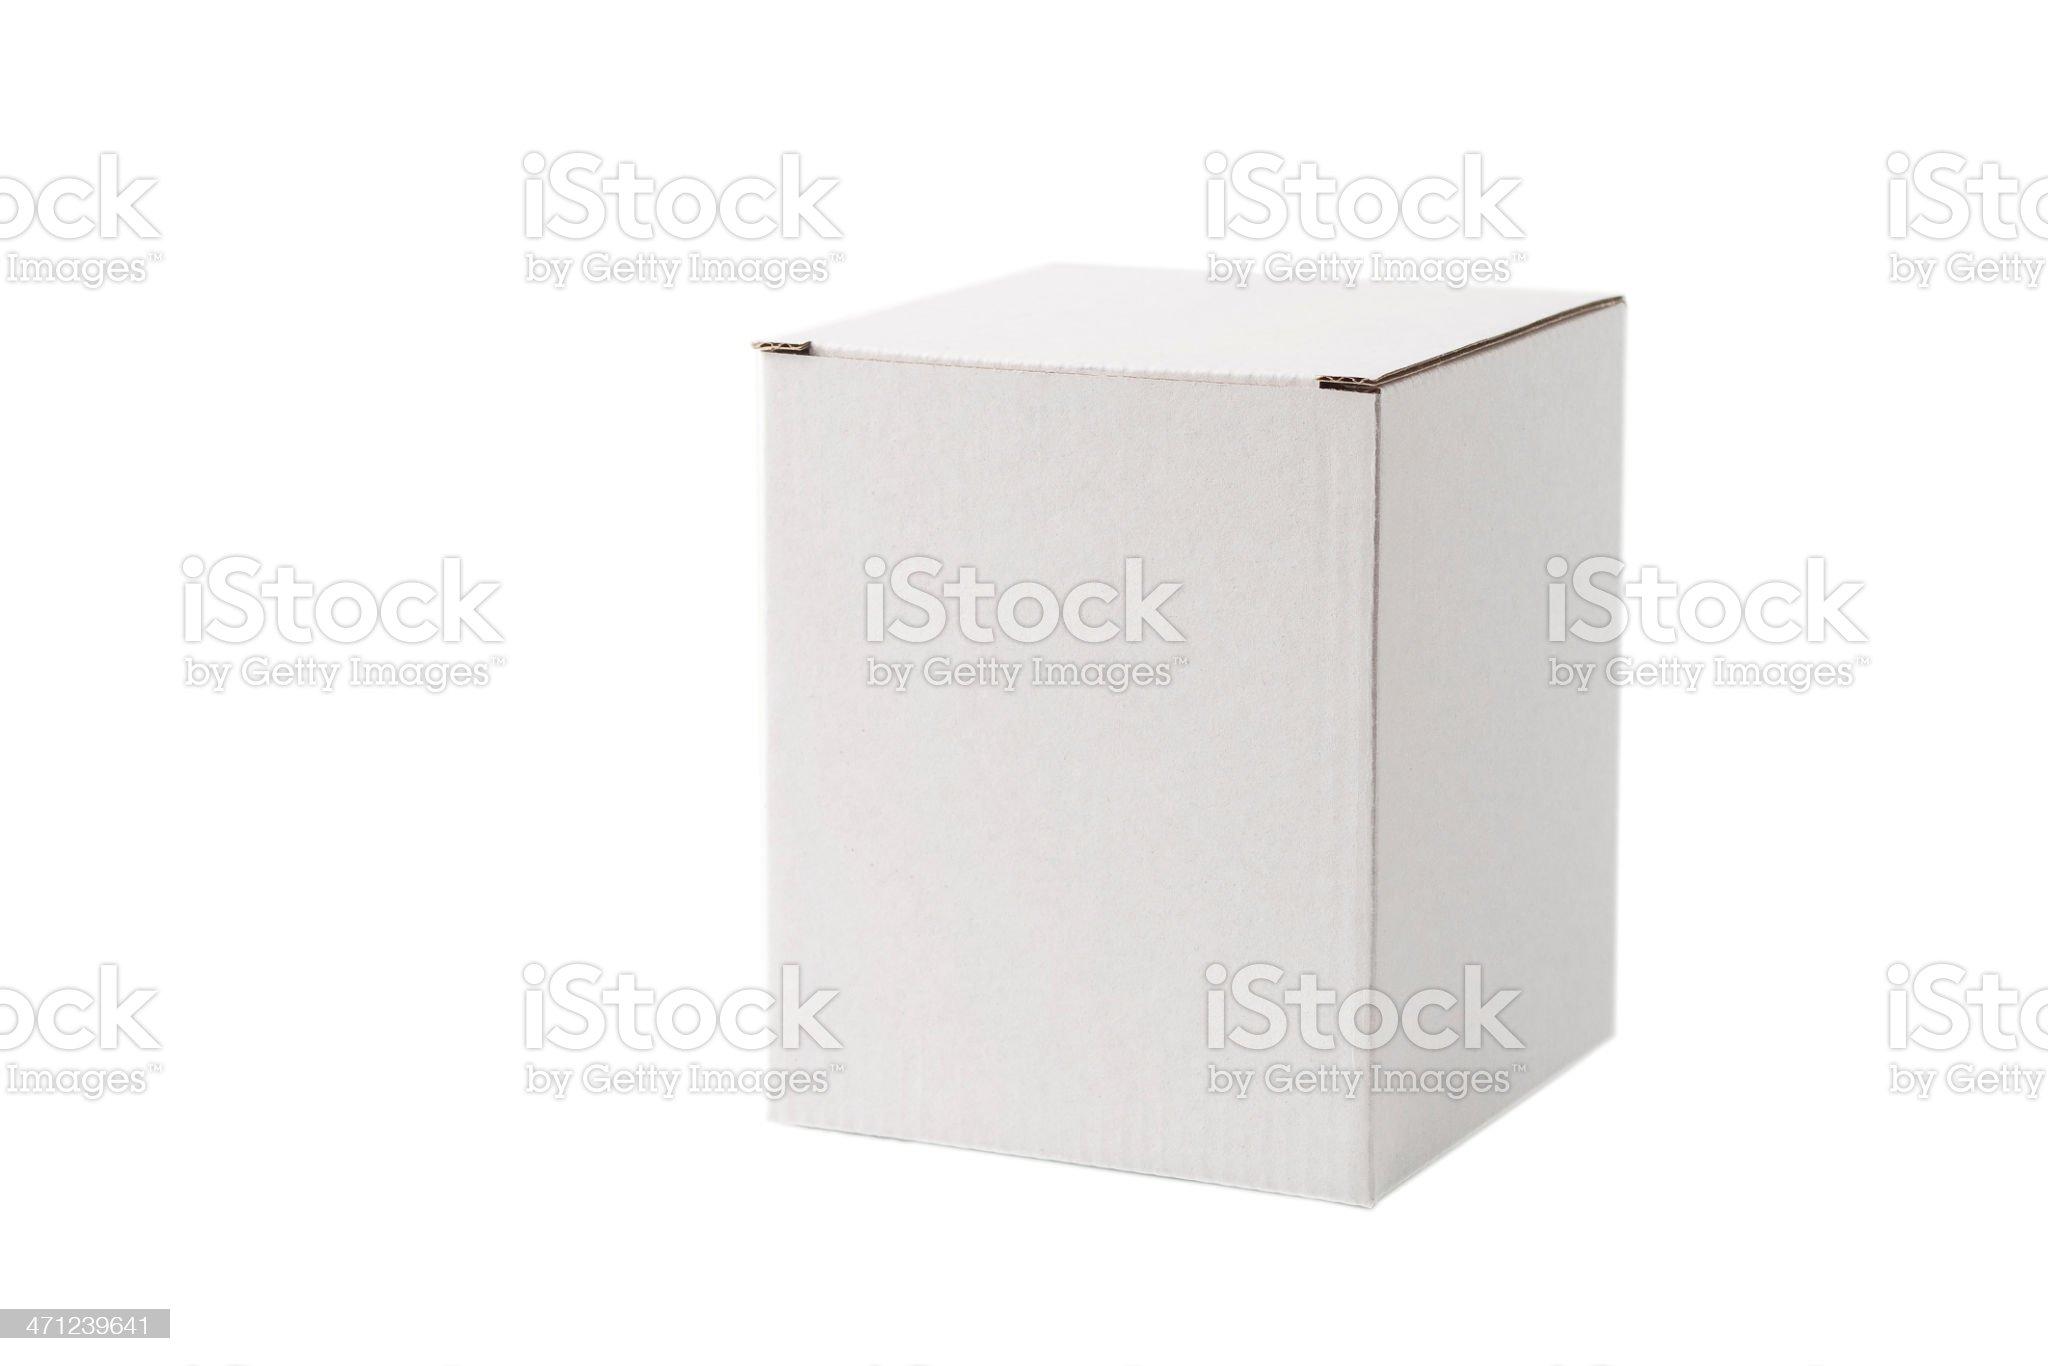 Closed white cardboard box royalty-free stock photo